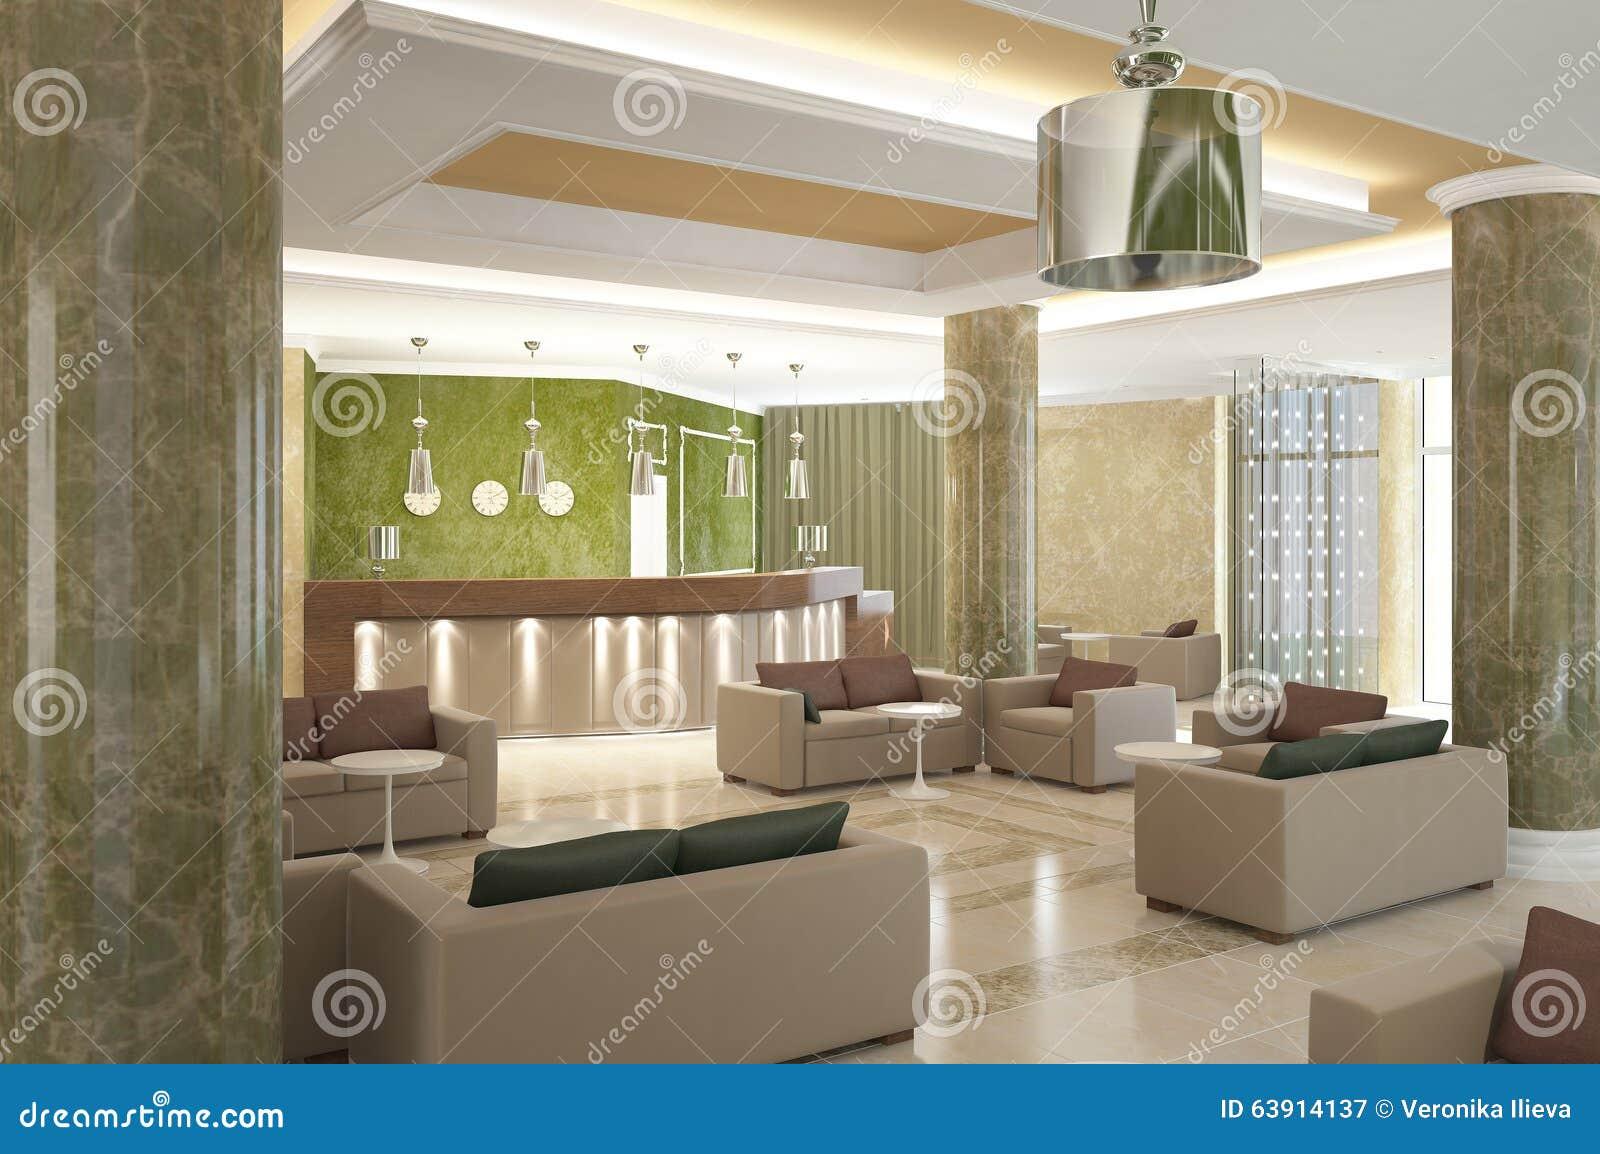 3d Visualization Of Hotel Interior Design Stock Illustration